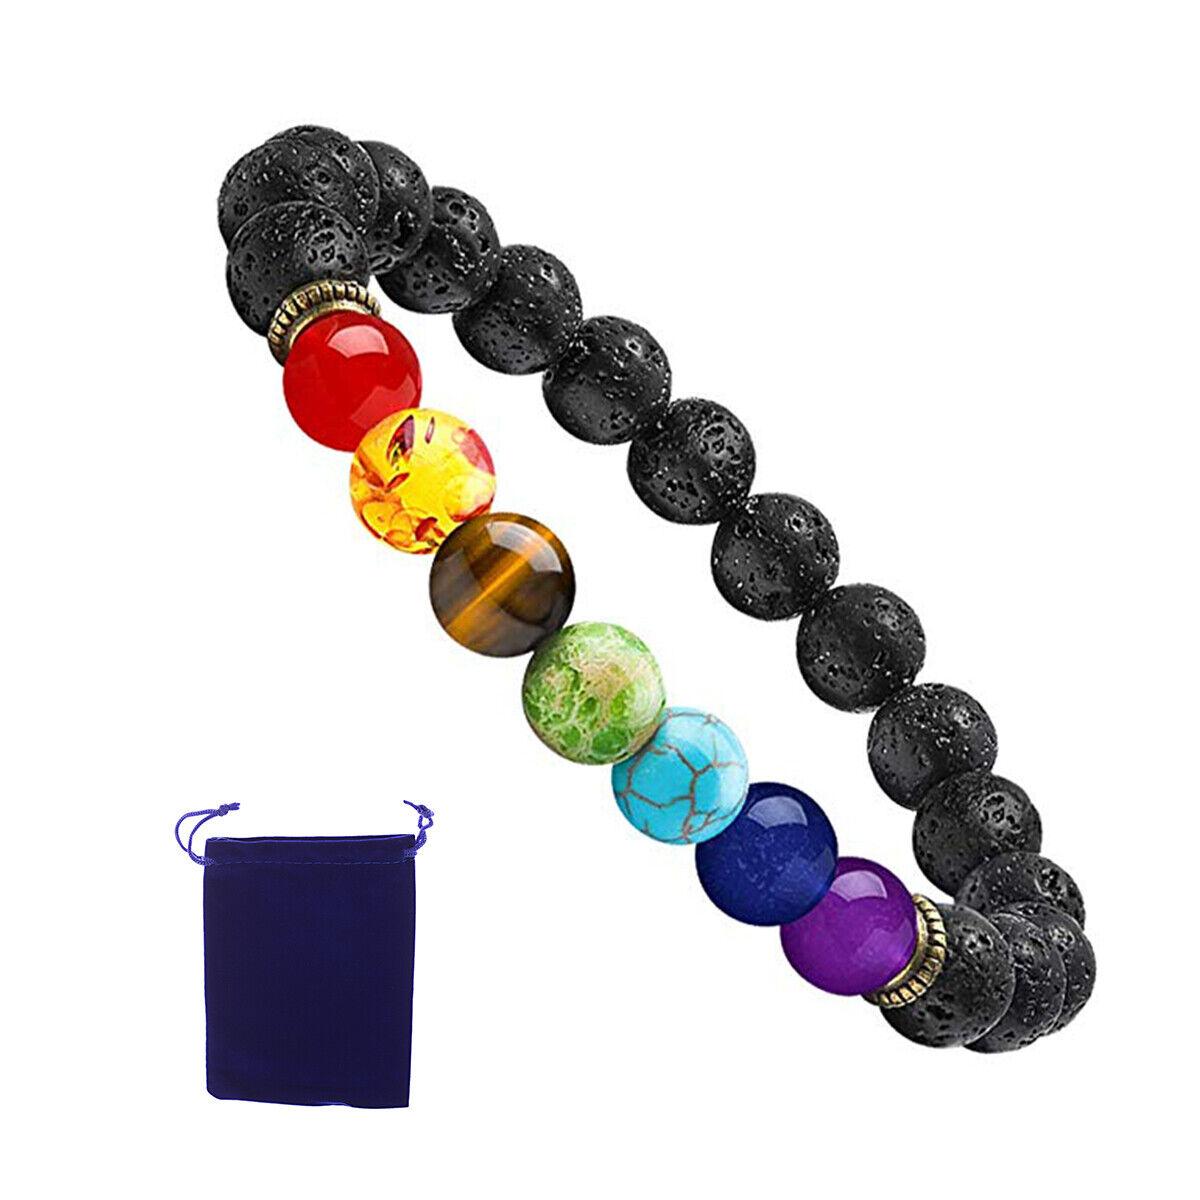 7 Chakras Men Anxiety Bracelets 8mm Lava Rock Stone Oil Bracelet For Men Women